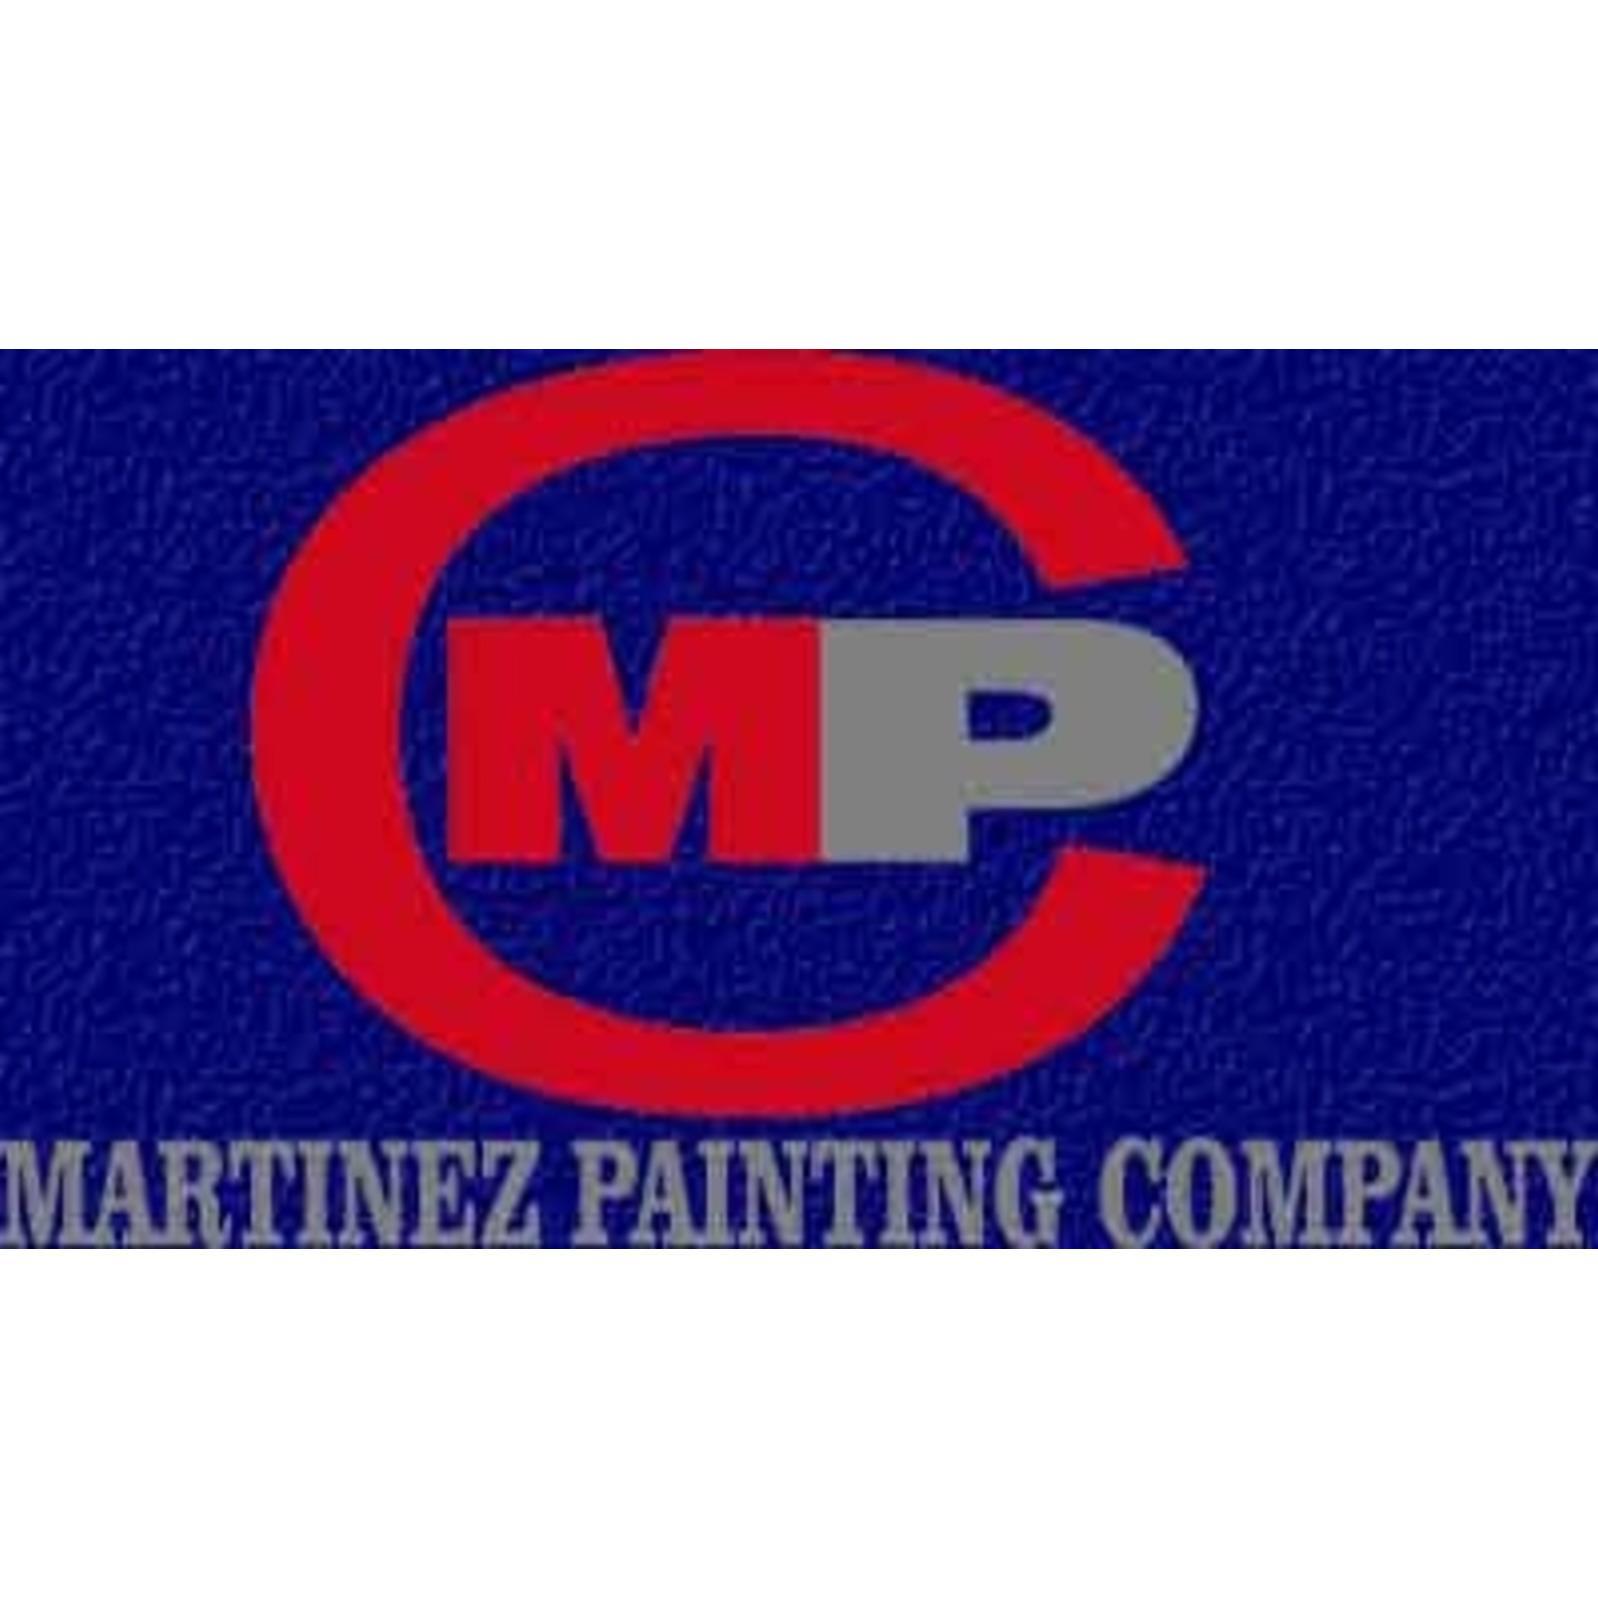 Martinez Painting Company